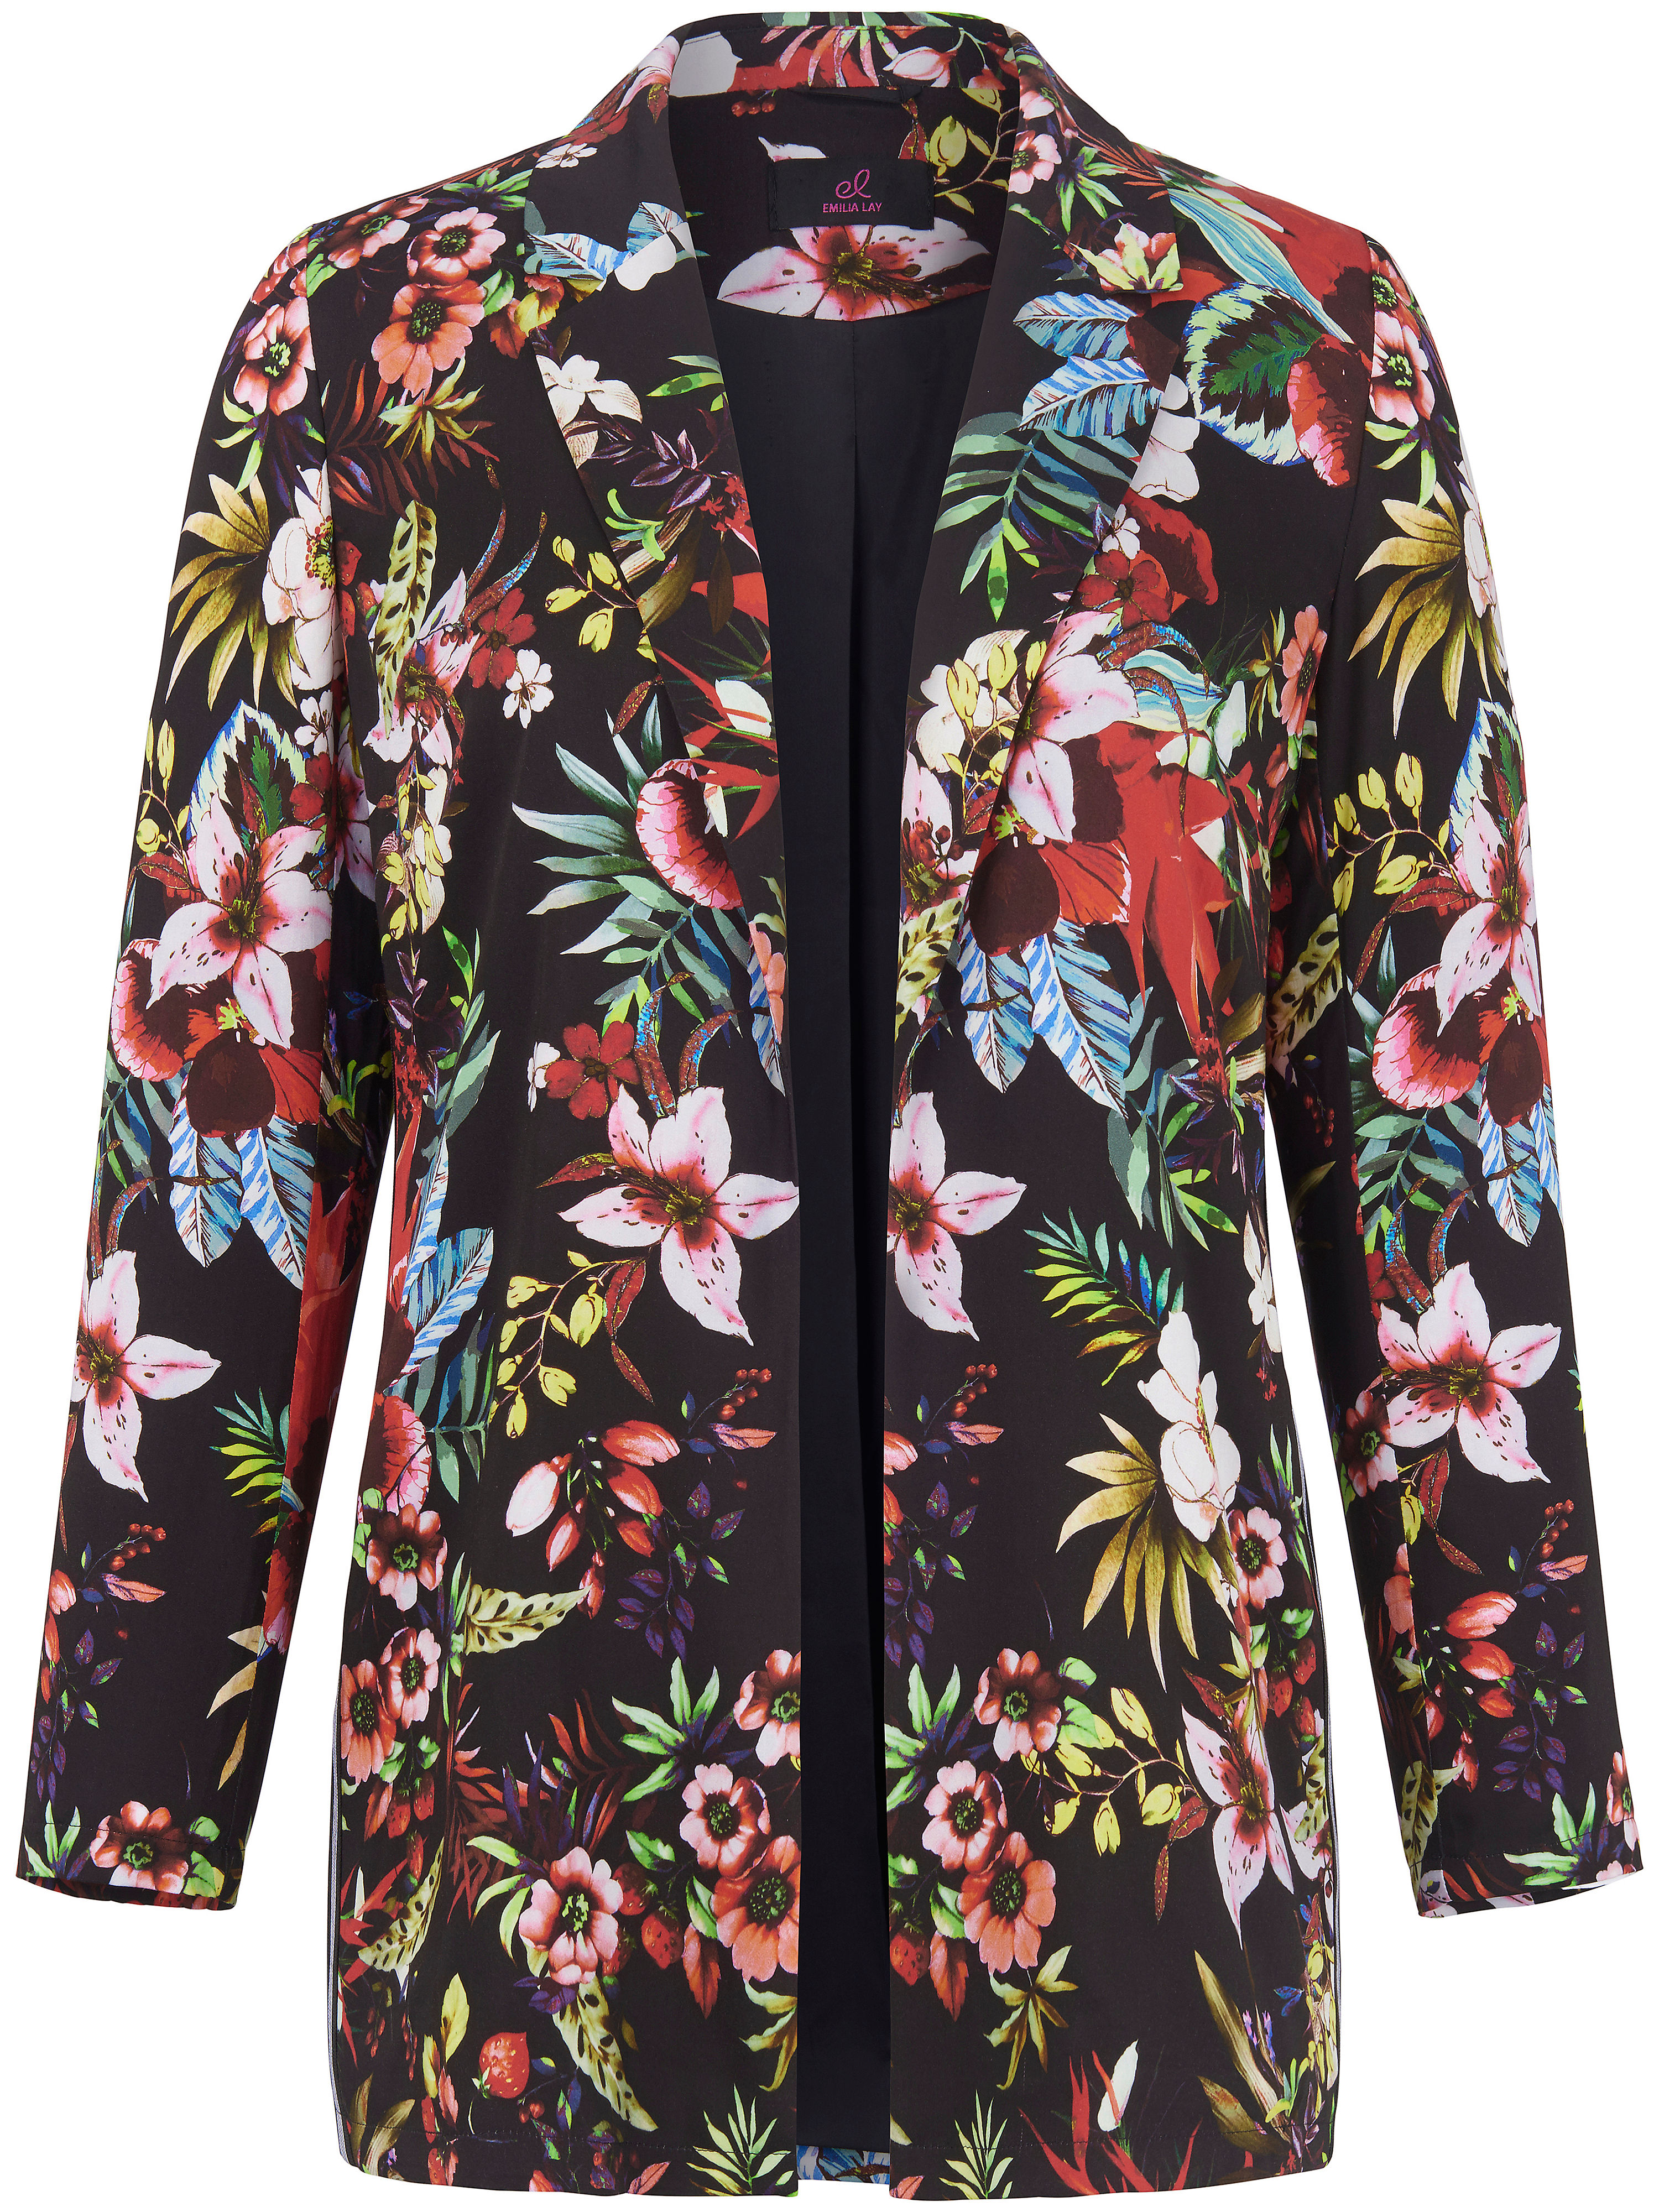 Lay Emilia Lay Multicolour Blazer Multicolour Emilia Blazer R3Sc54LqAj